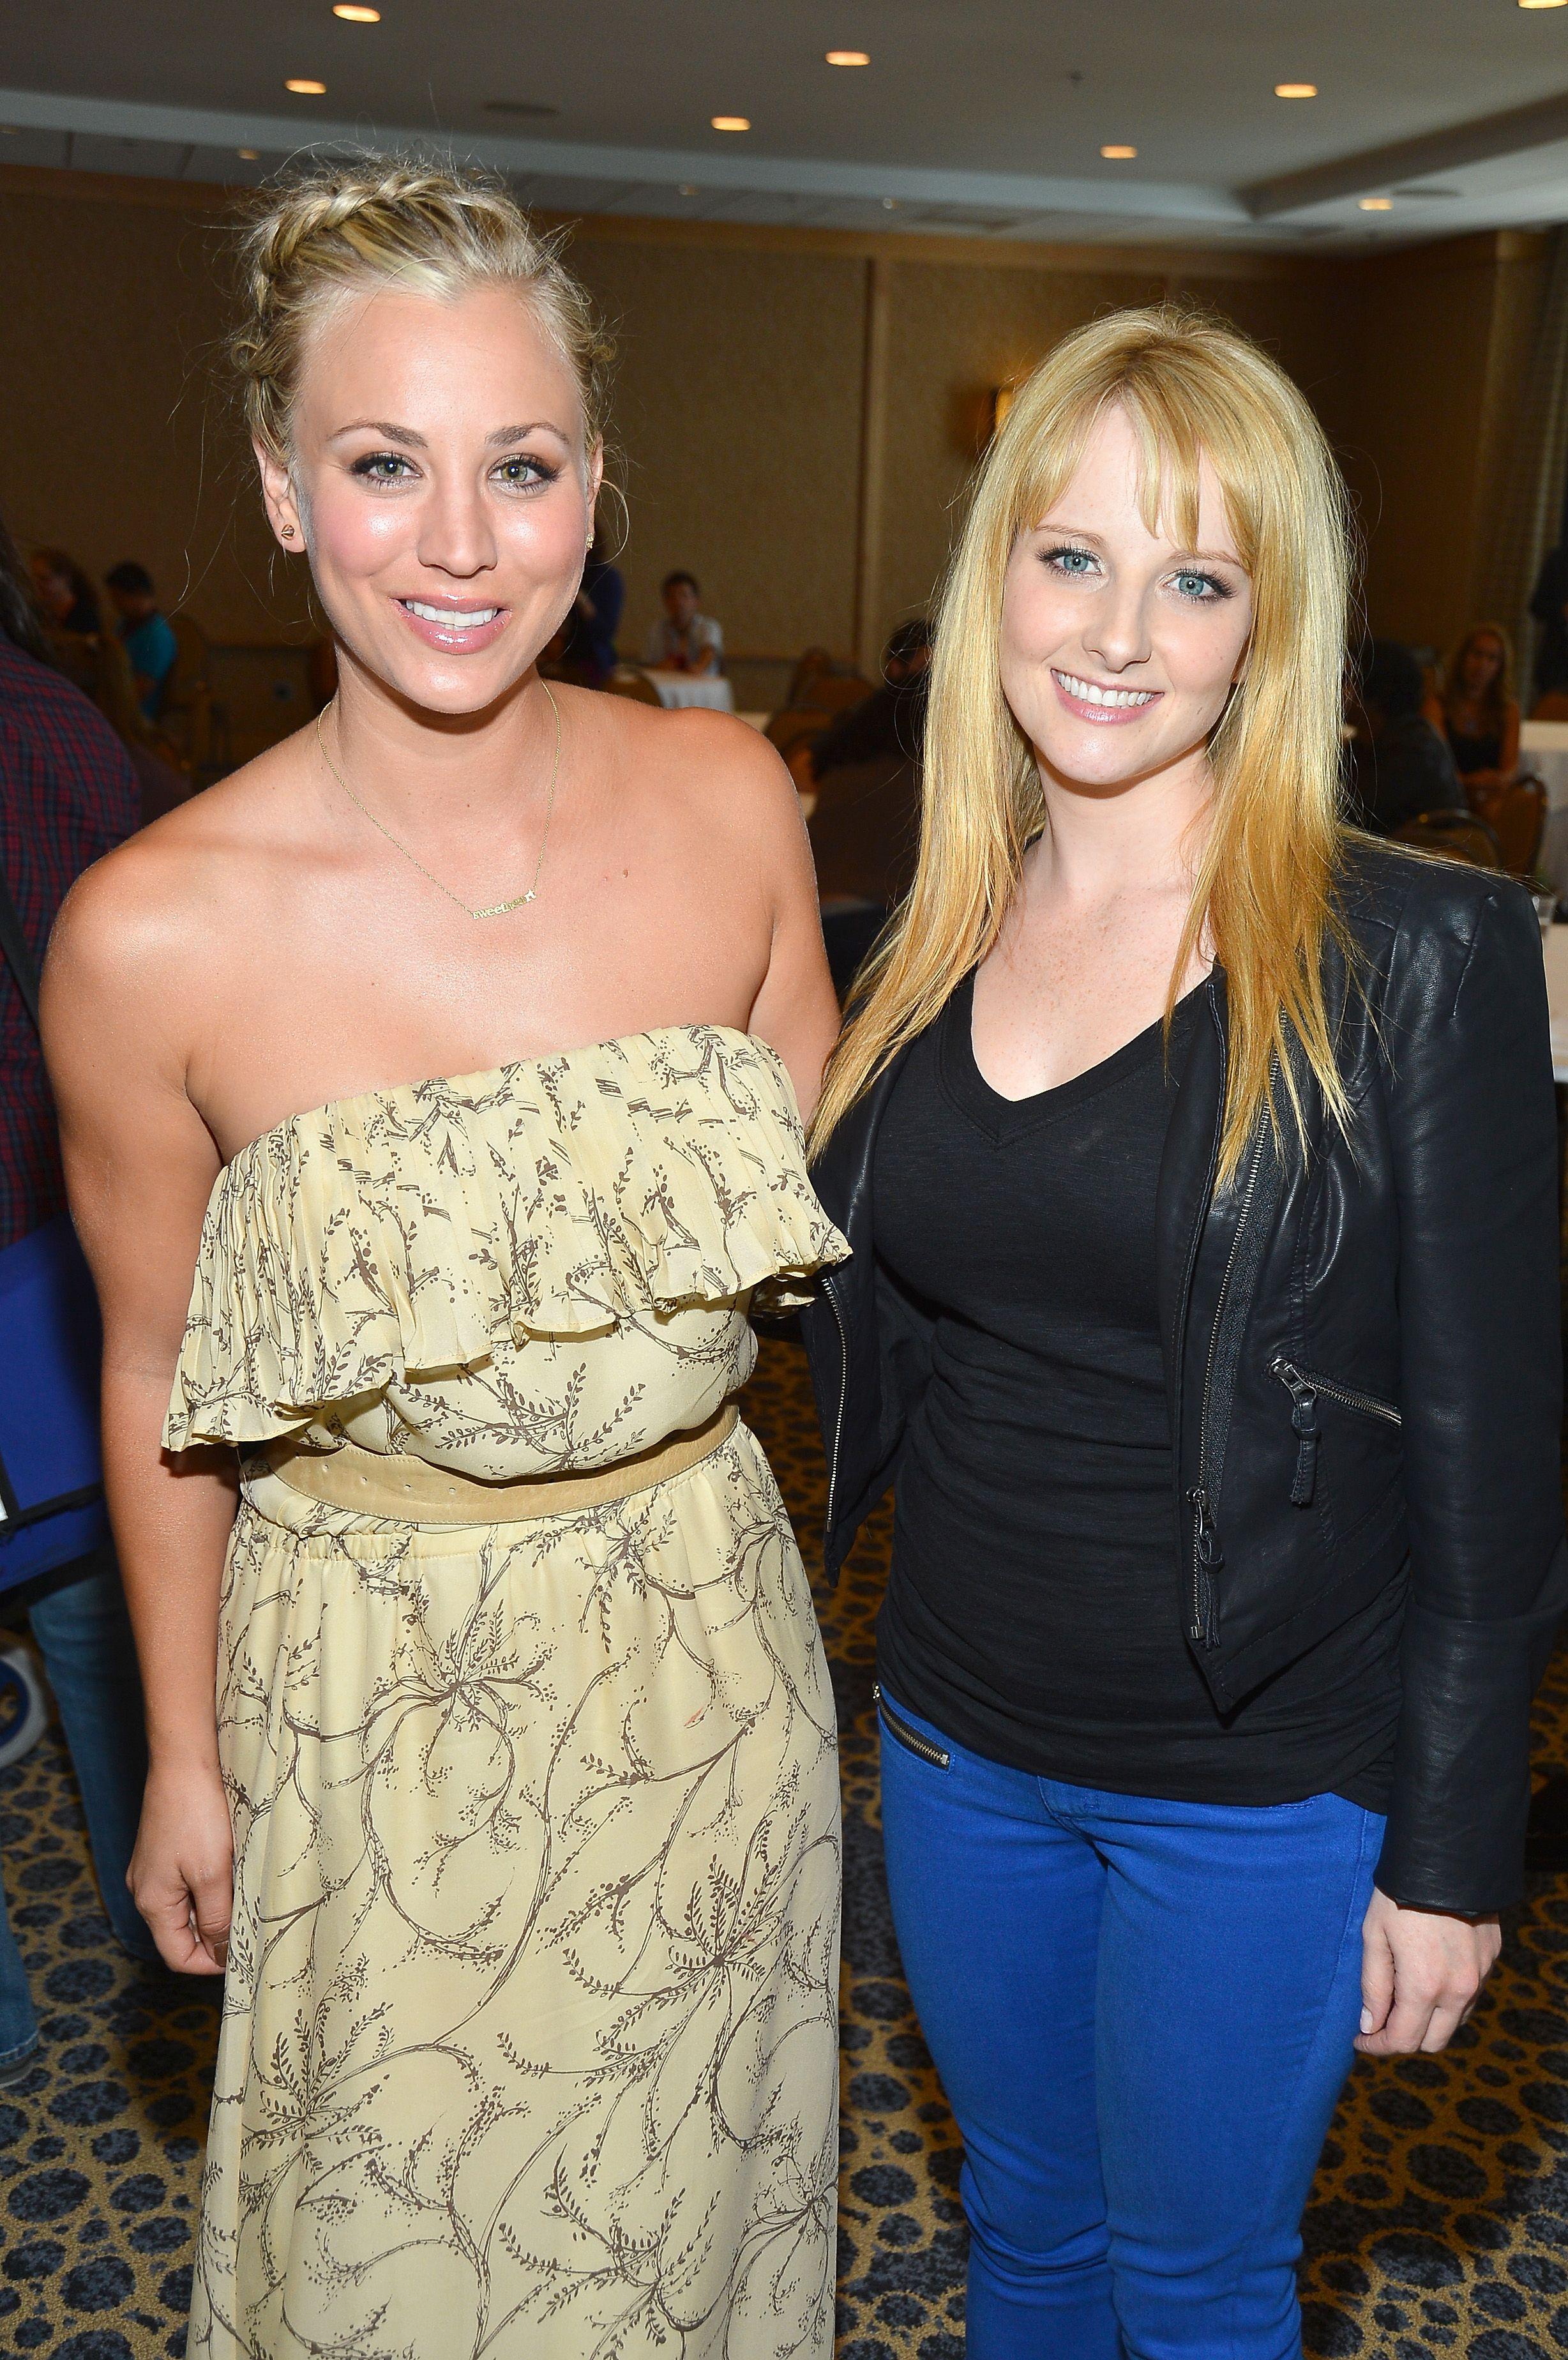 Kaley Cuoco & Melissa Rauch